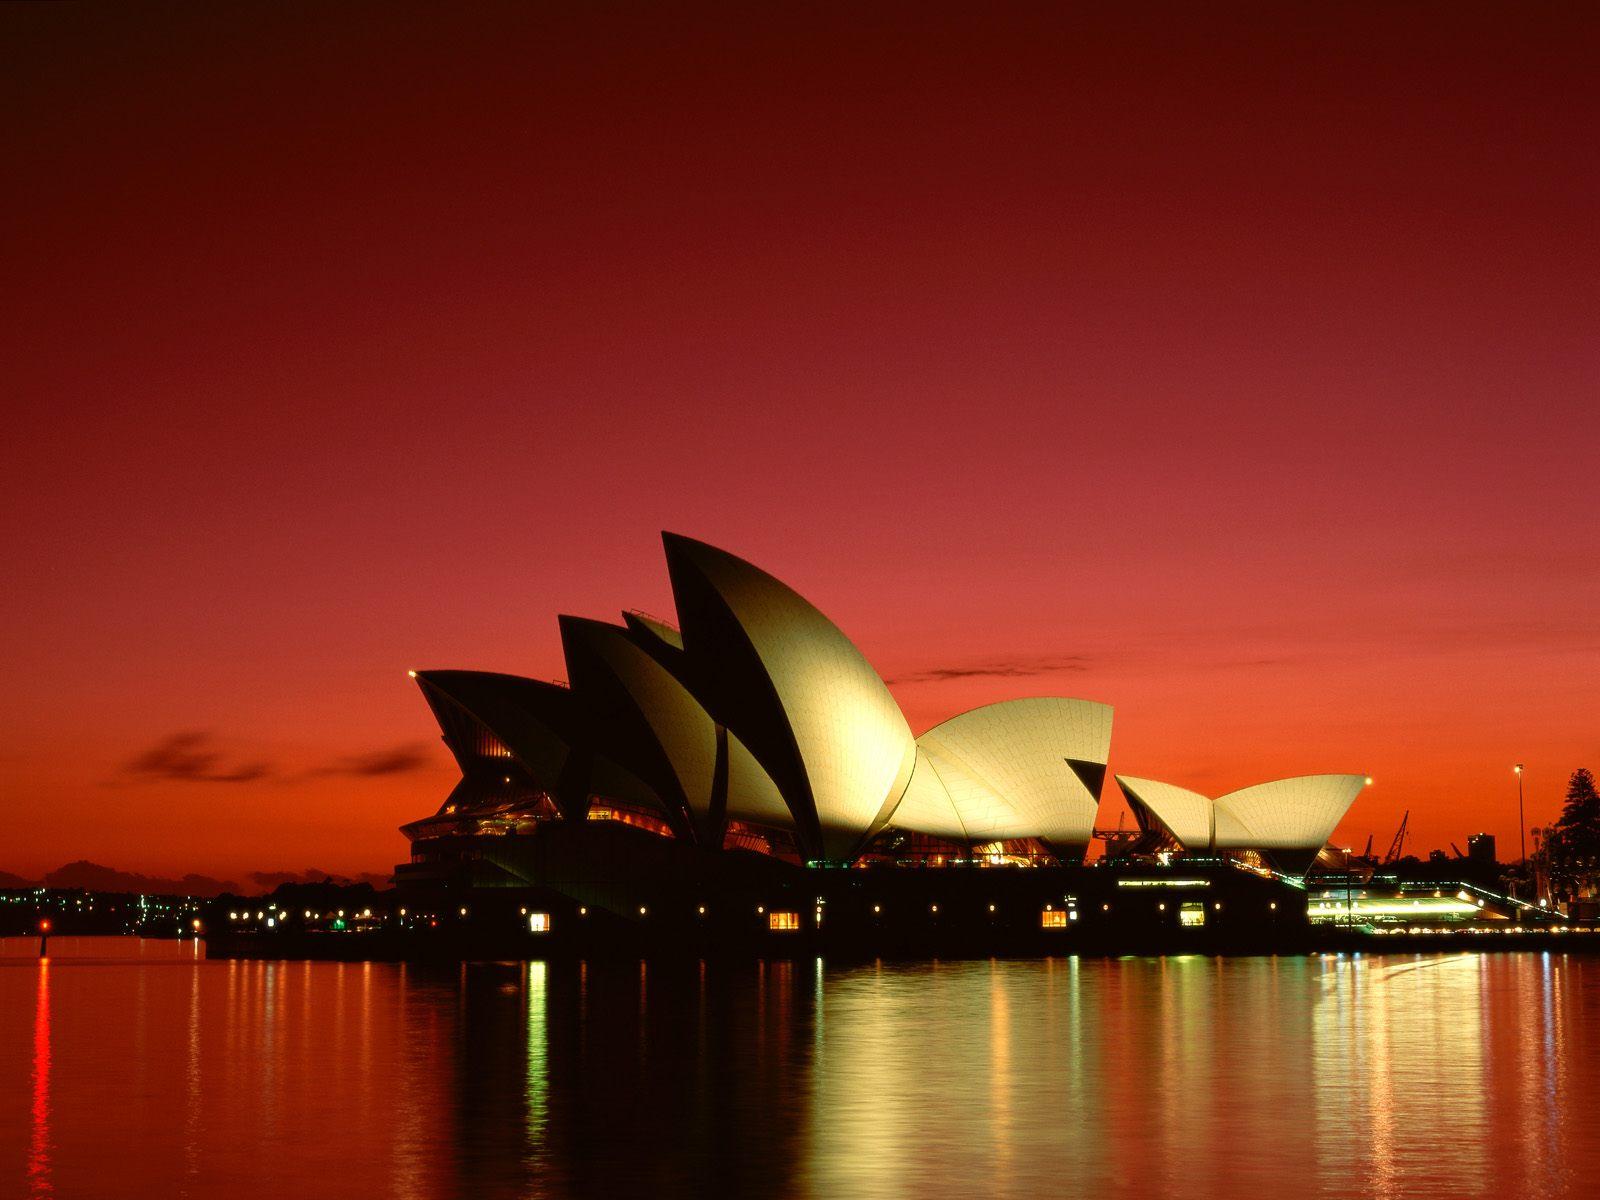 http://2.bp.blogspot.com/-N_wyNASXiWI/UEBRVX7YE8I/AAAAAAAAApk/moyqJ-tun-A/s1600/Sydney+Wallpaper+HD+2012-2013+02.jpg